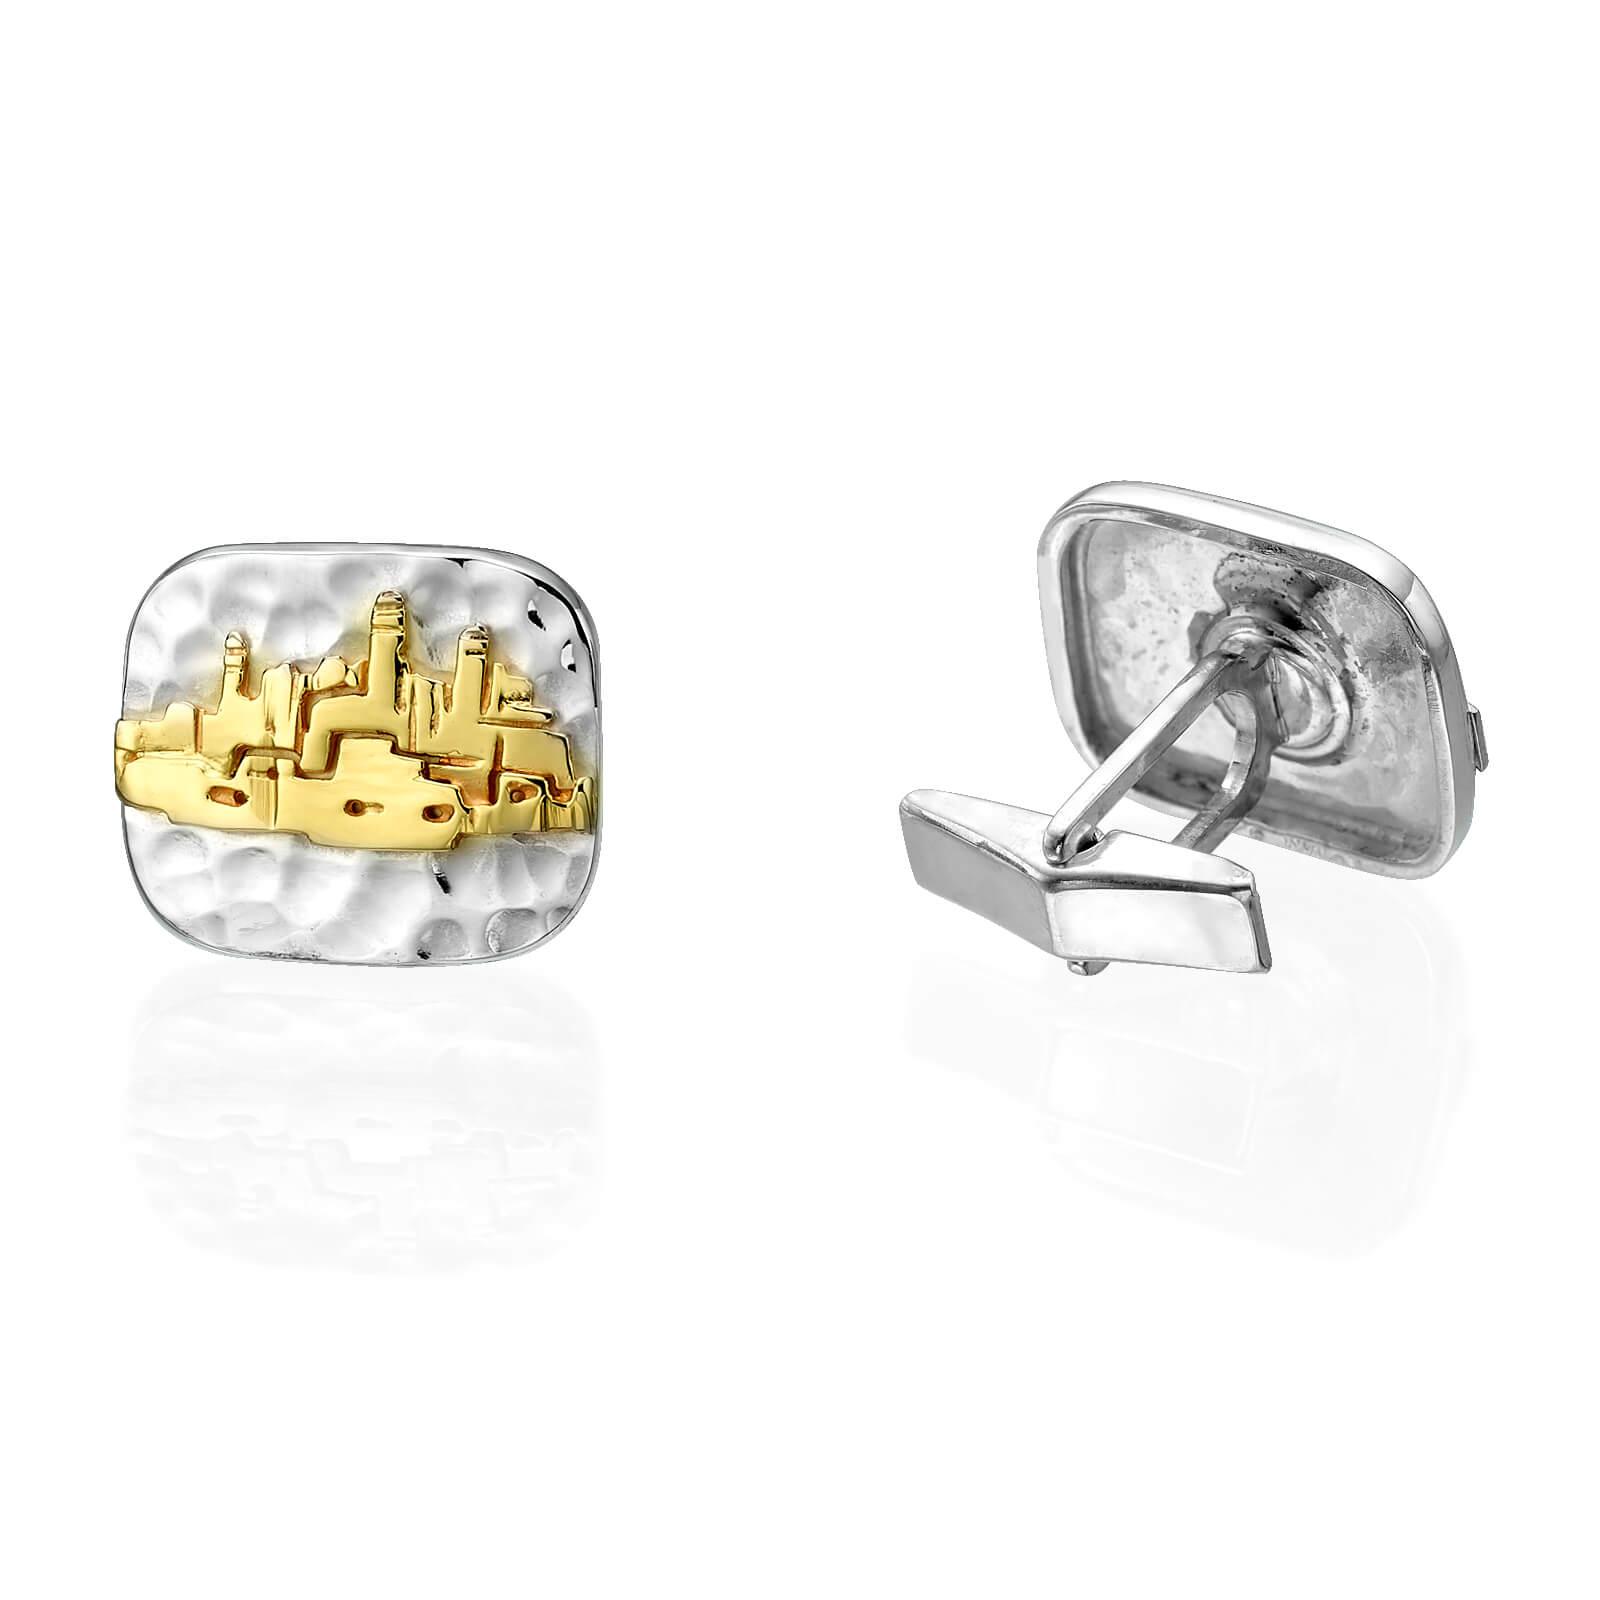 Hammered Silver and Gold Jerusalem Cufflinks - Baltinester Jewelry